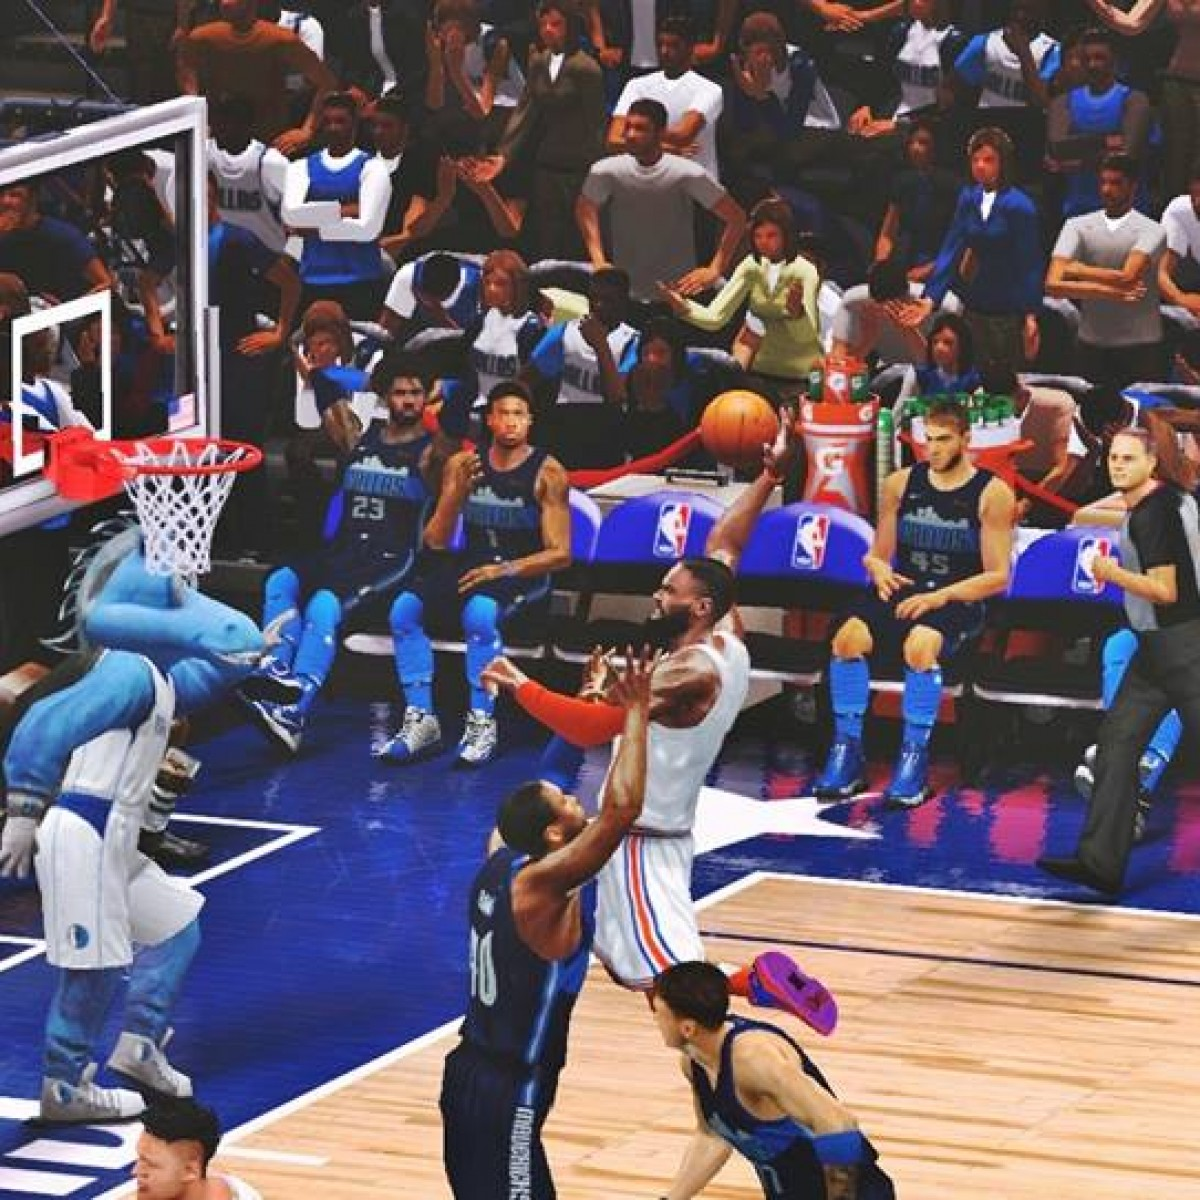 Roster nba 2k14 NBA Roster